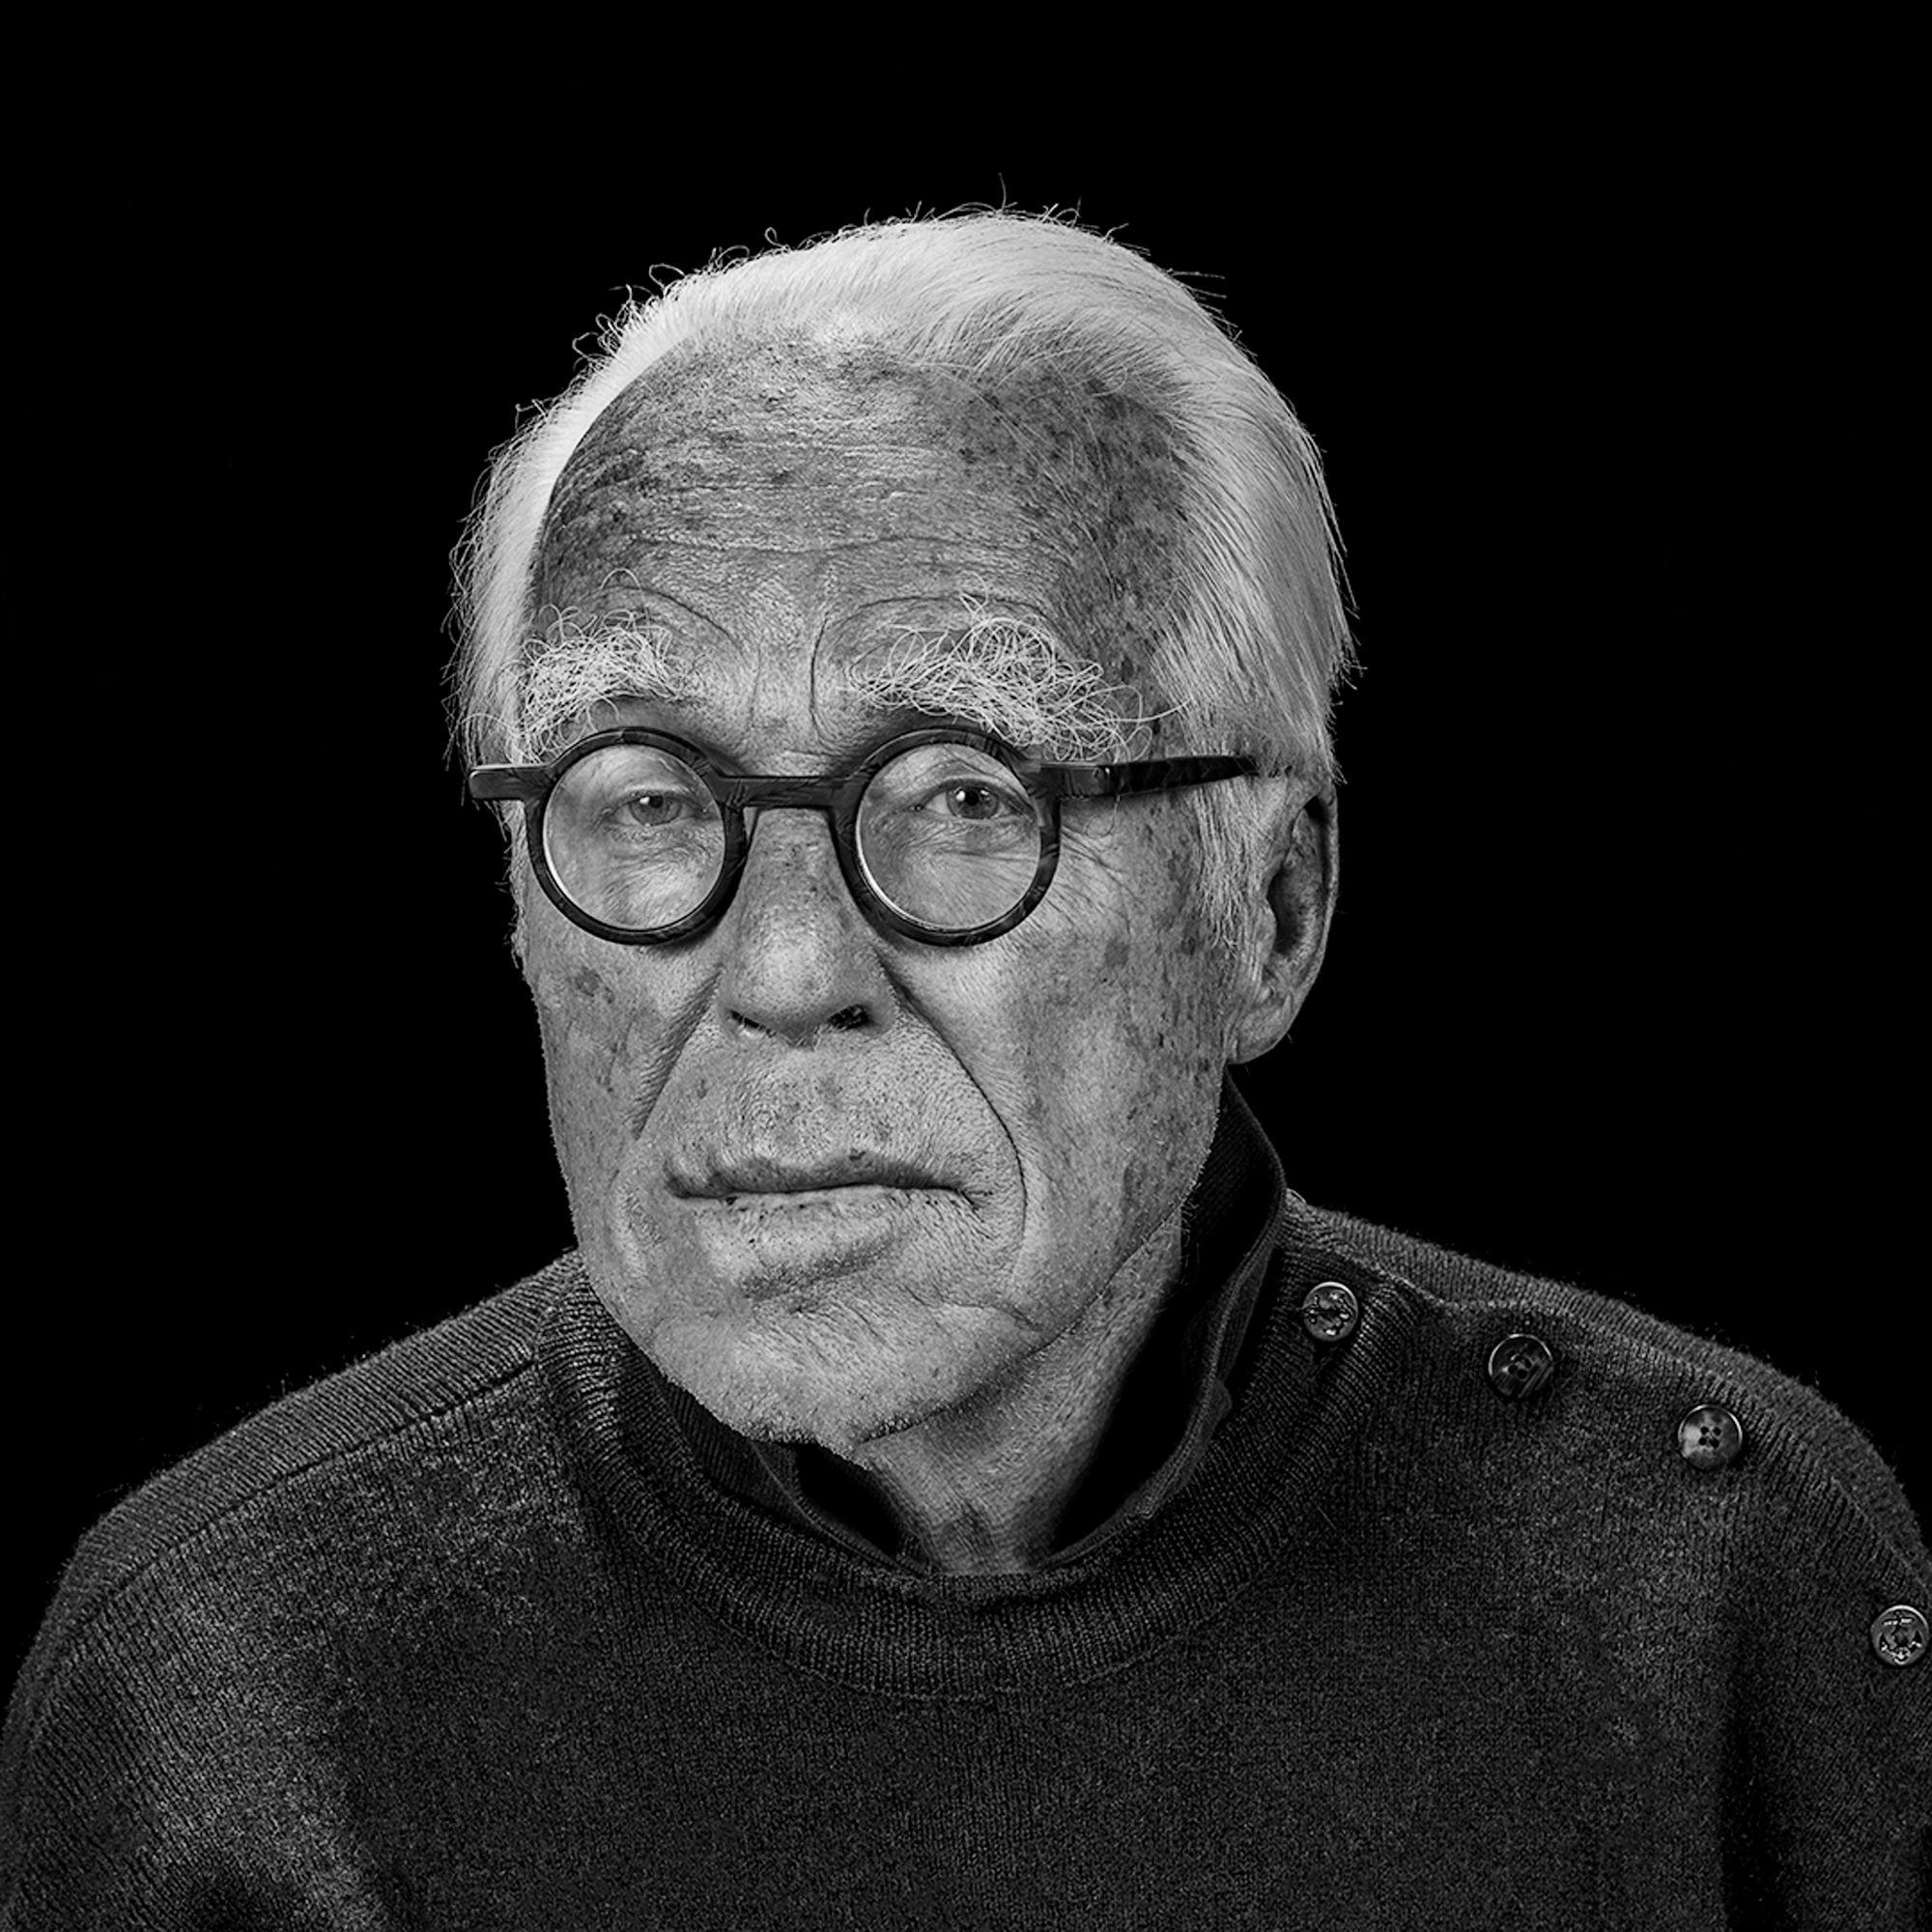 John guare, playwright